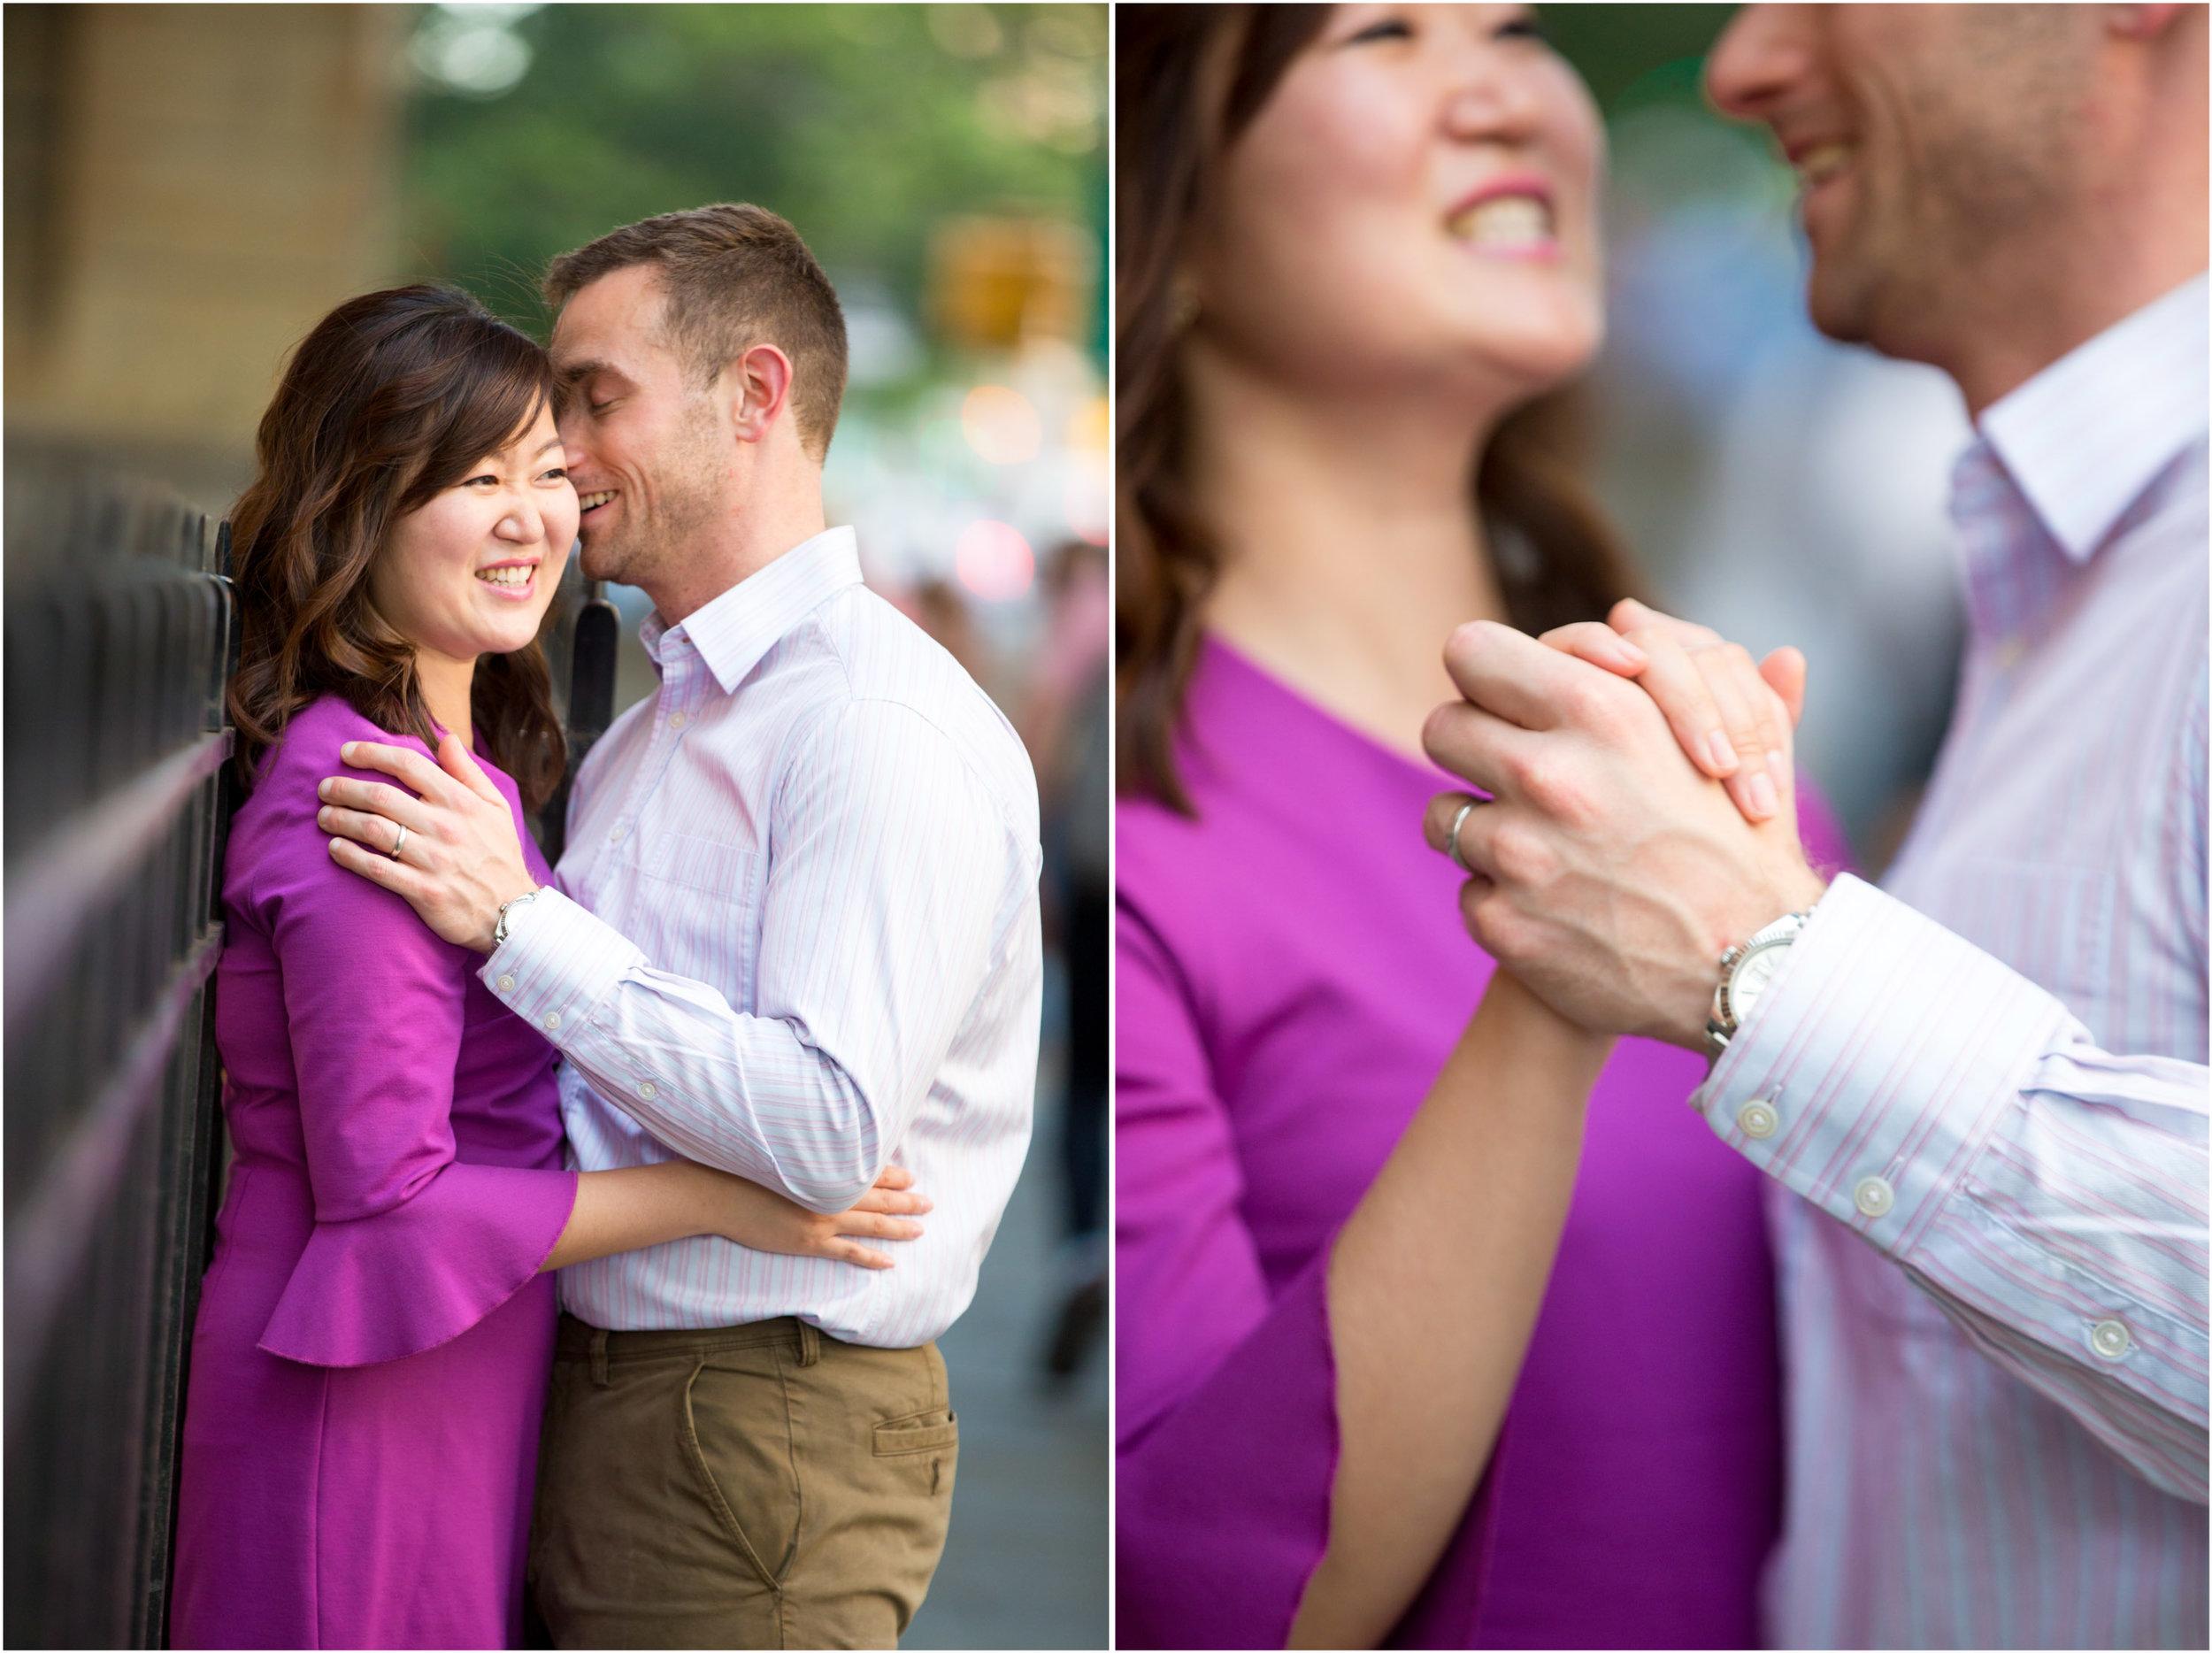 West Village Washington Square Park NYC Marriage Engagement Photo Session Shoot-2.jpg